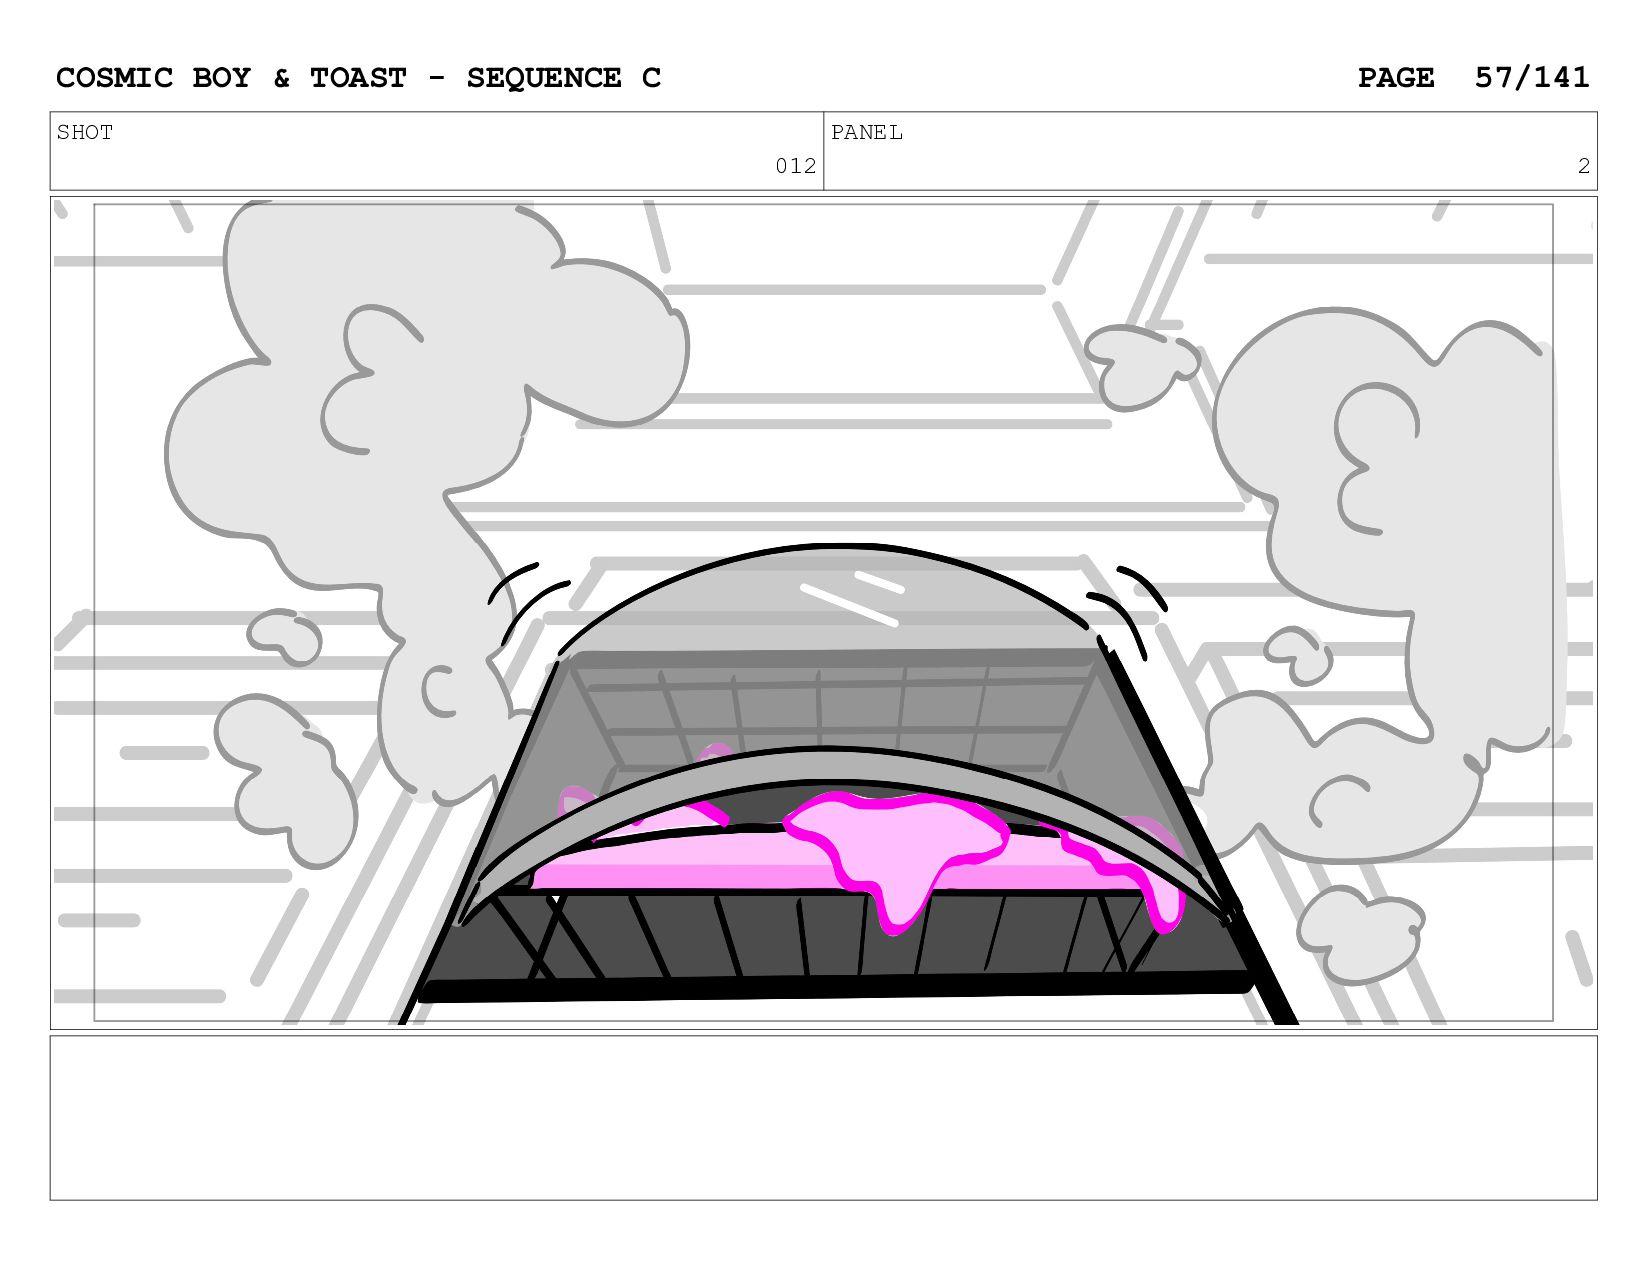 SCENE 012 PANEL B COSMIC BOY & TOAST - SEQUENCE...